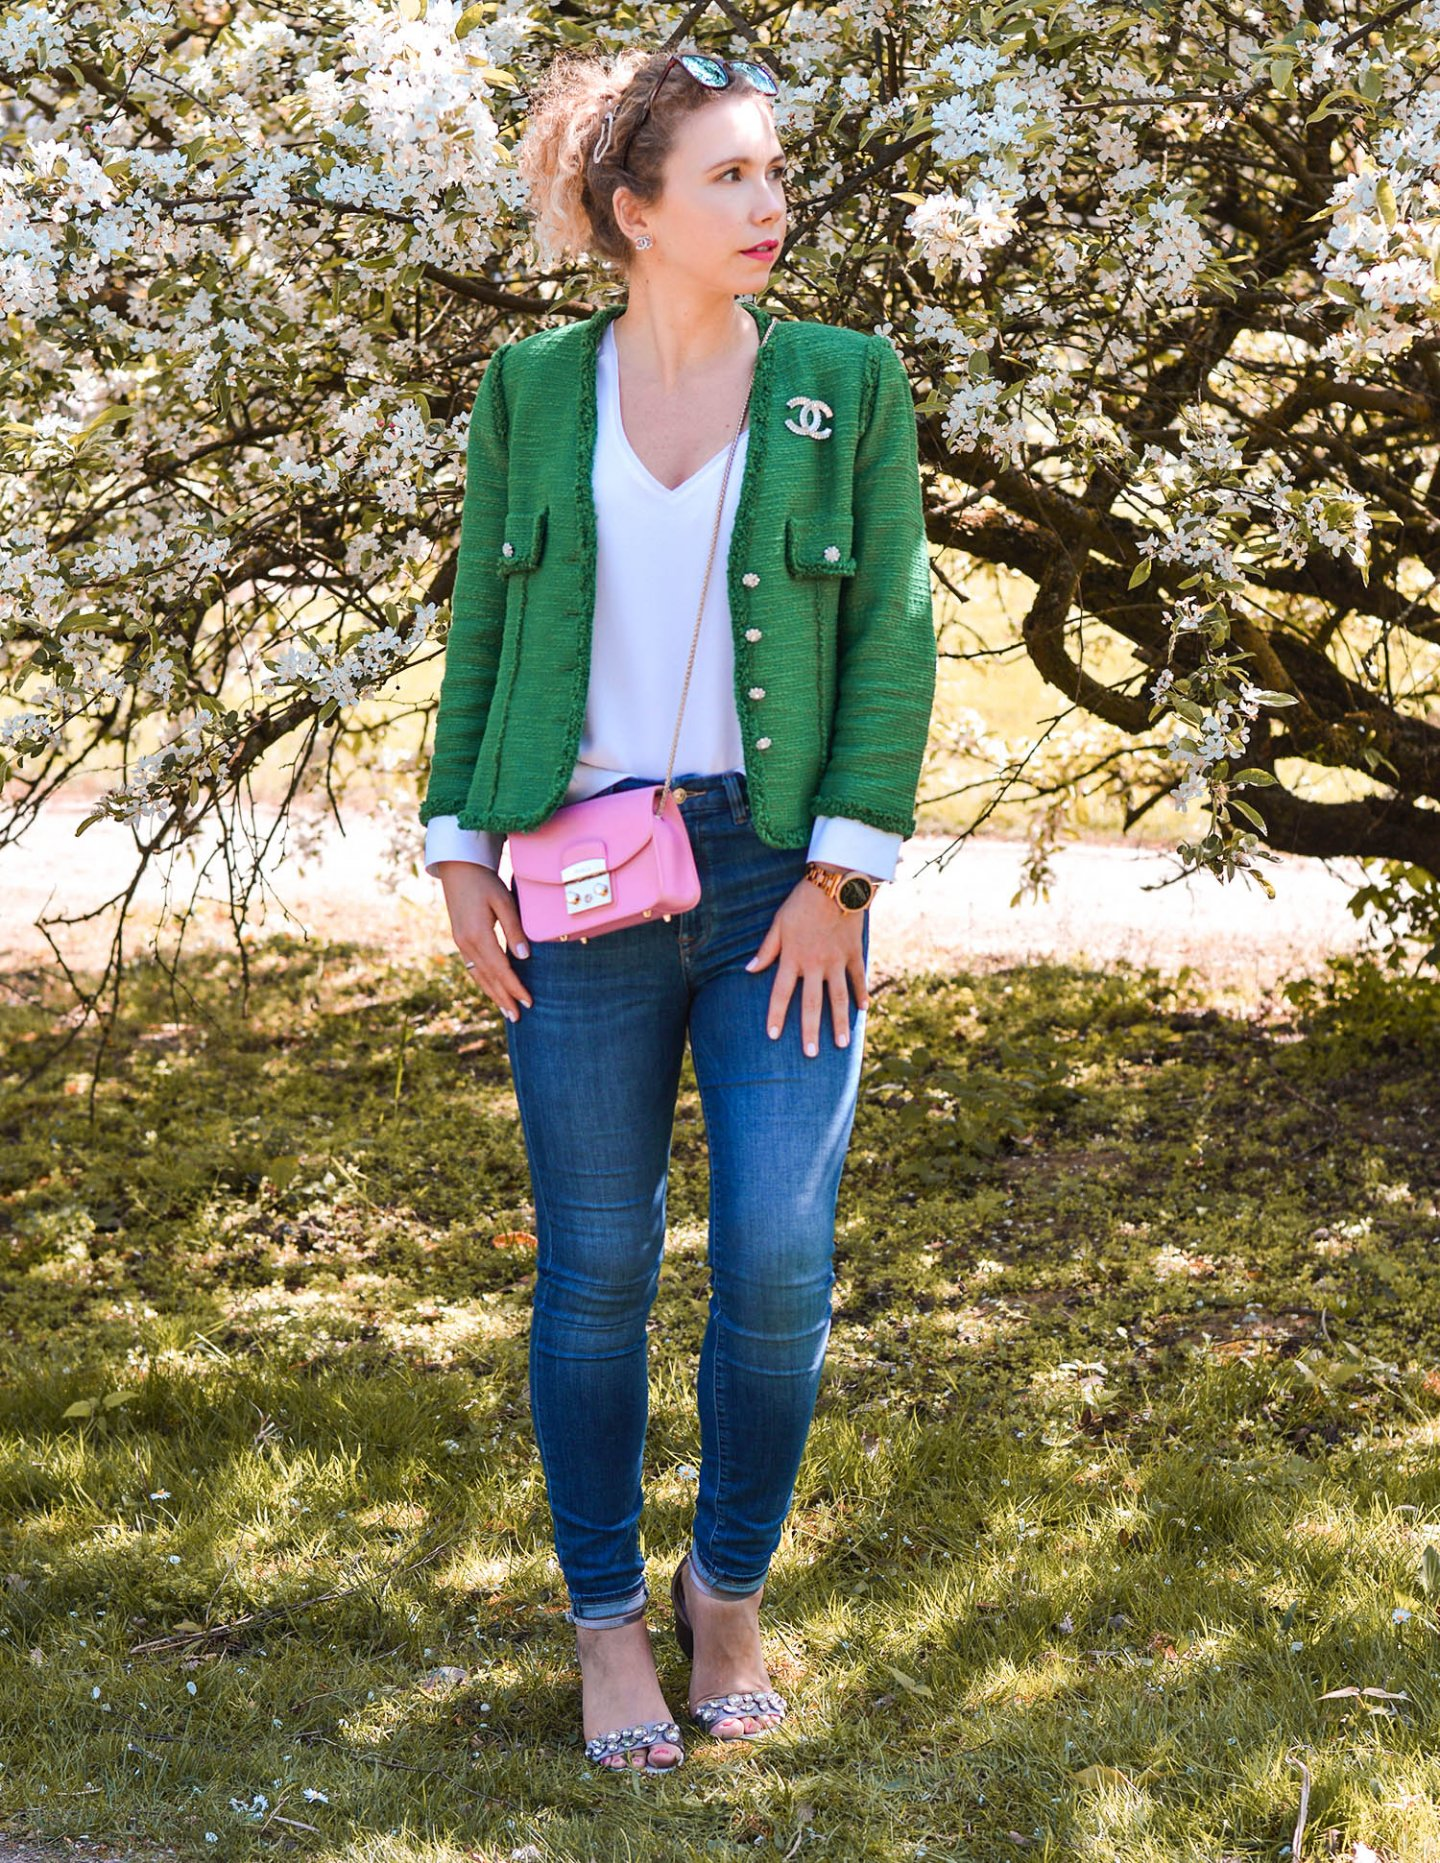 Frühlingsoutfit 2019 - farbige tweedjacken